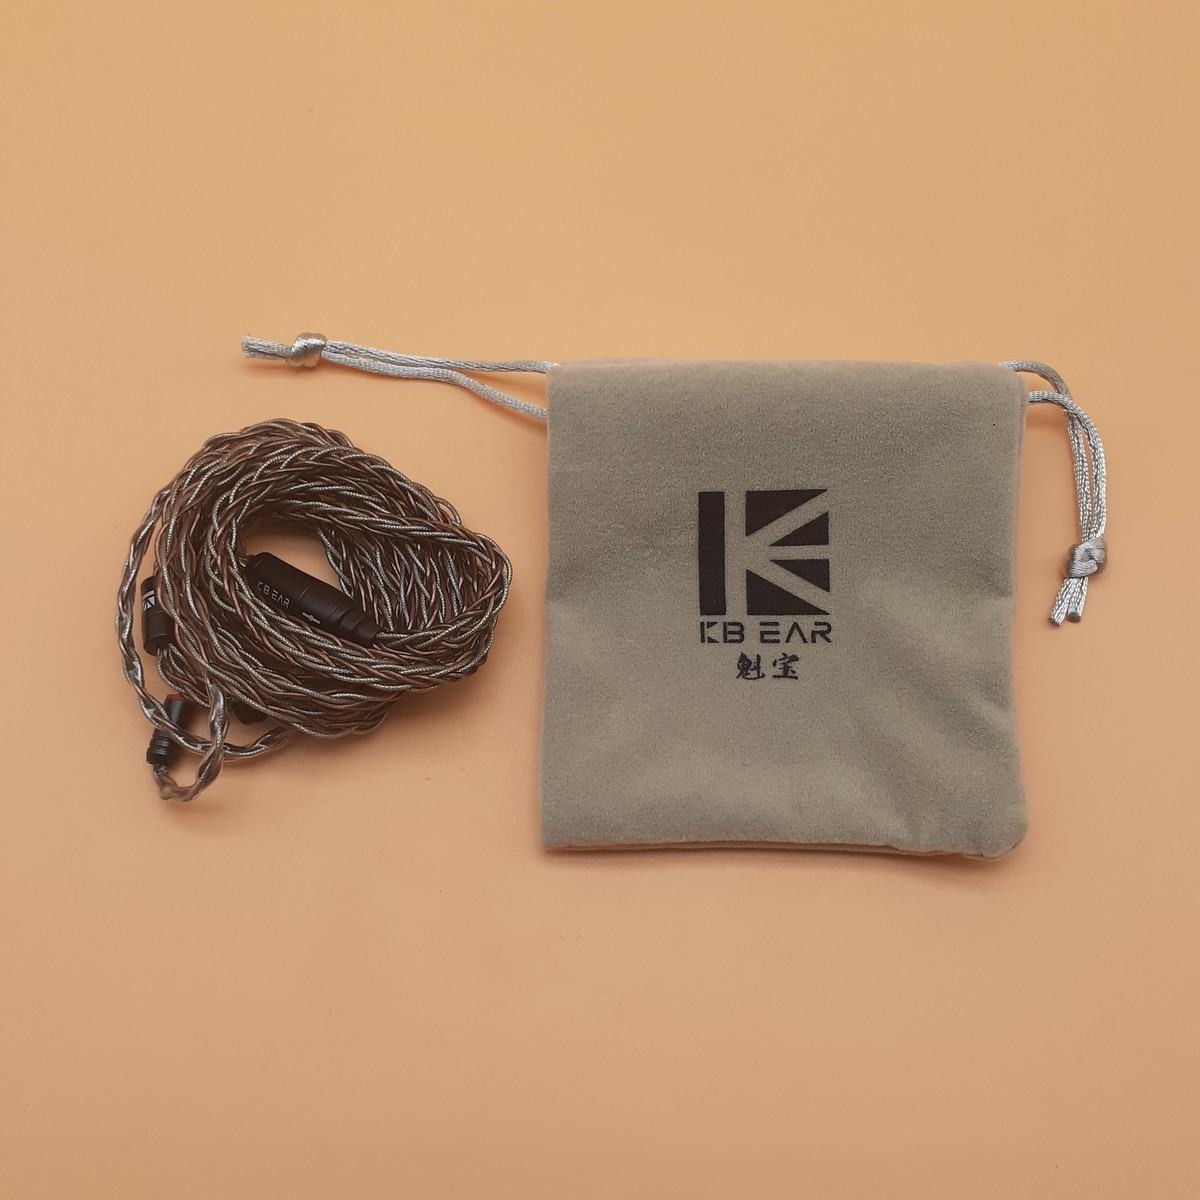 KBEAR KBX4905